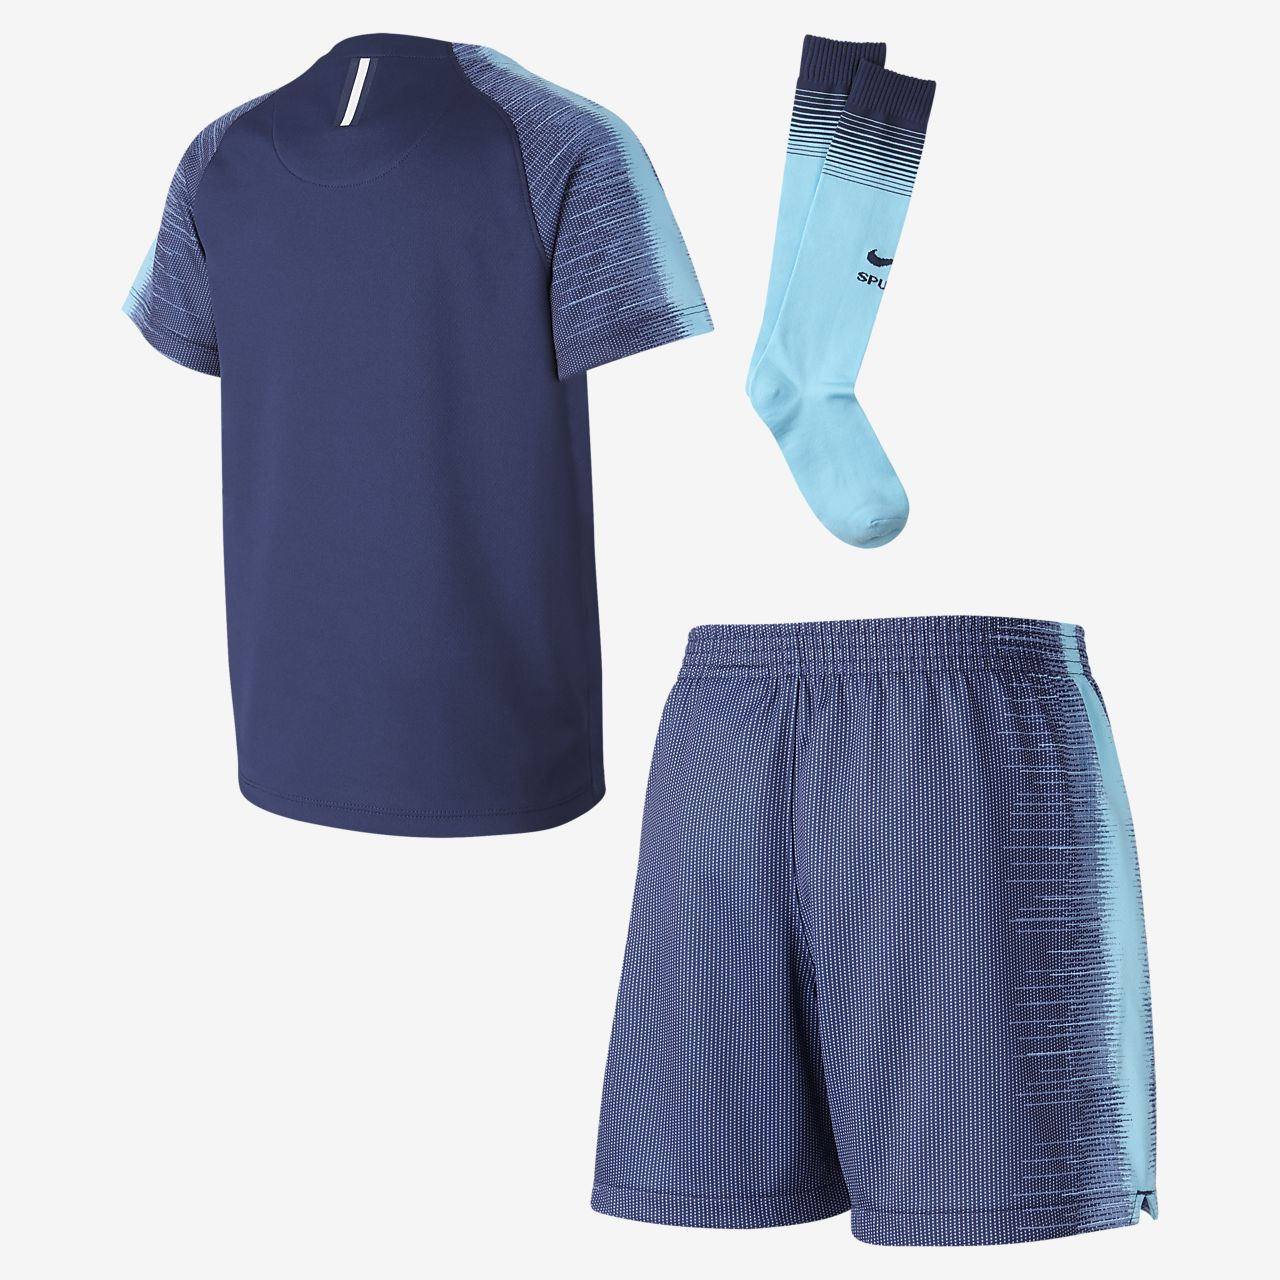 ... Kit de fútbol para niños talla pequeña 2018 19 Tottenham Hotspur  Stadium Away ef97c003042ed